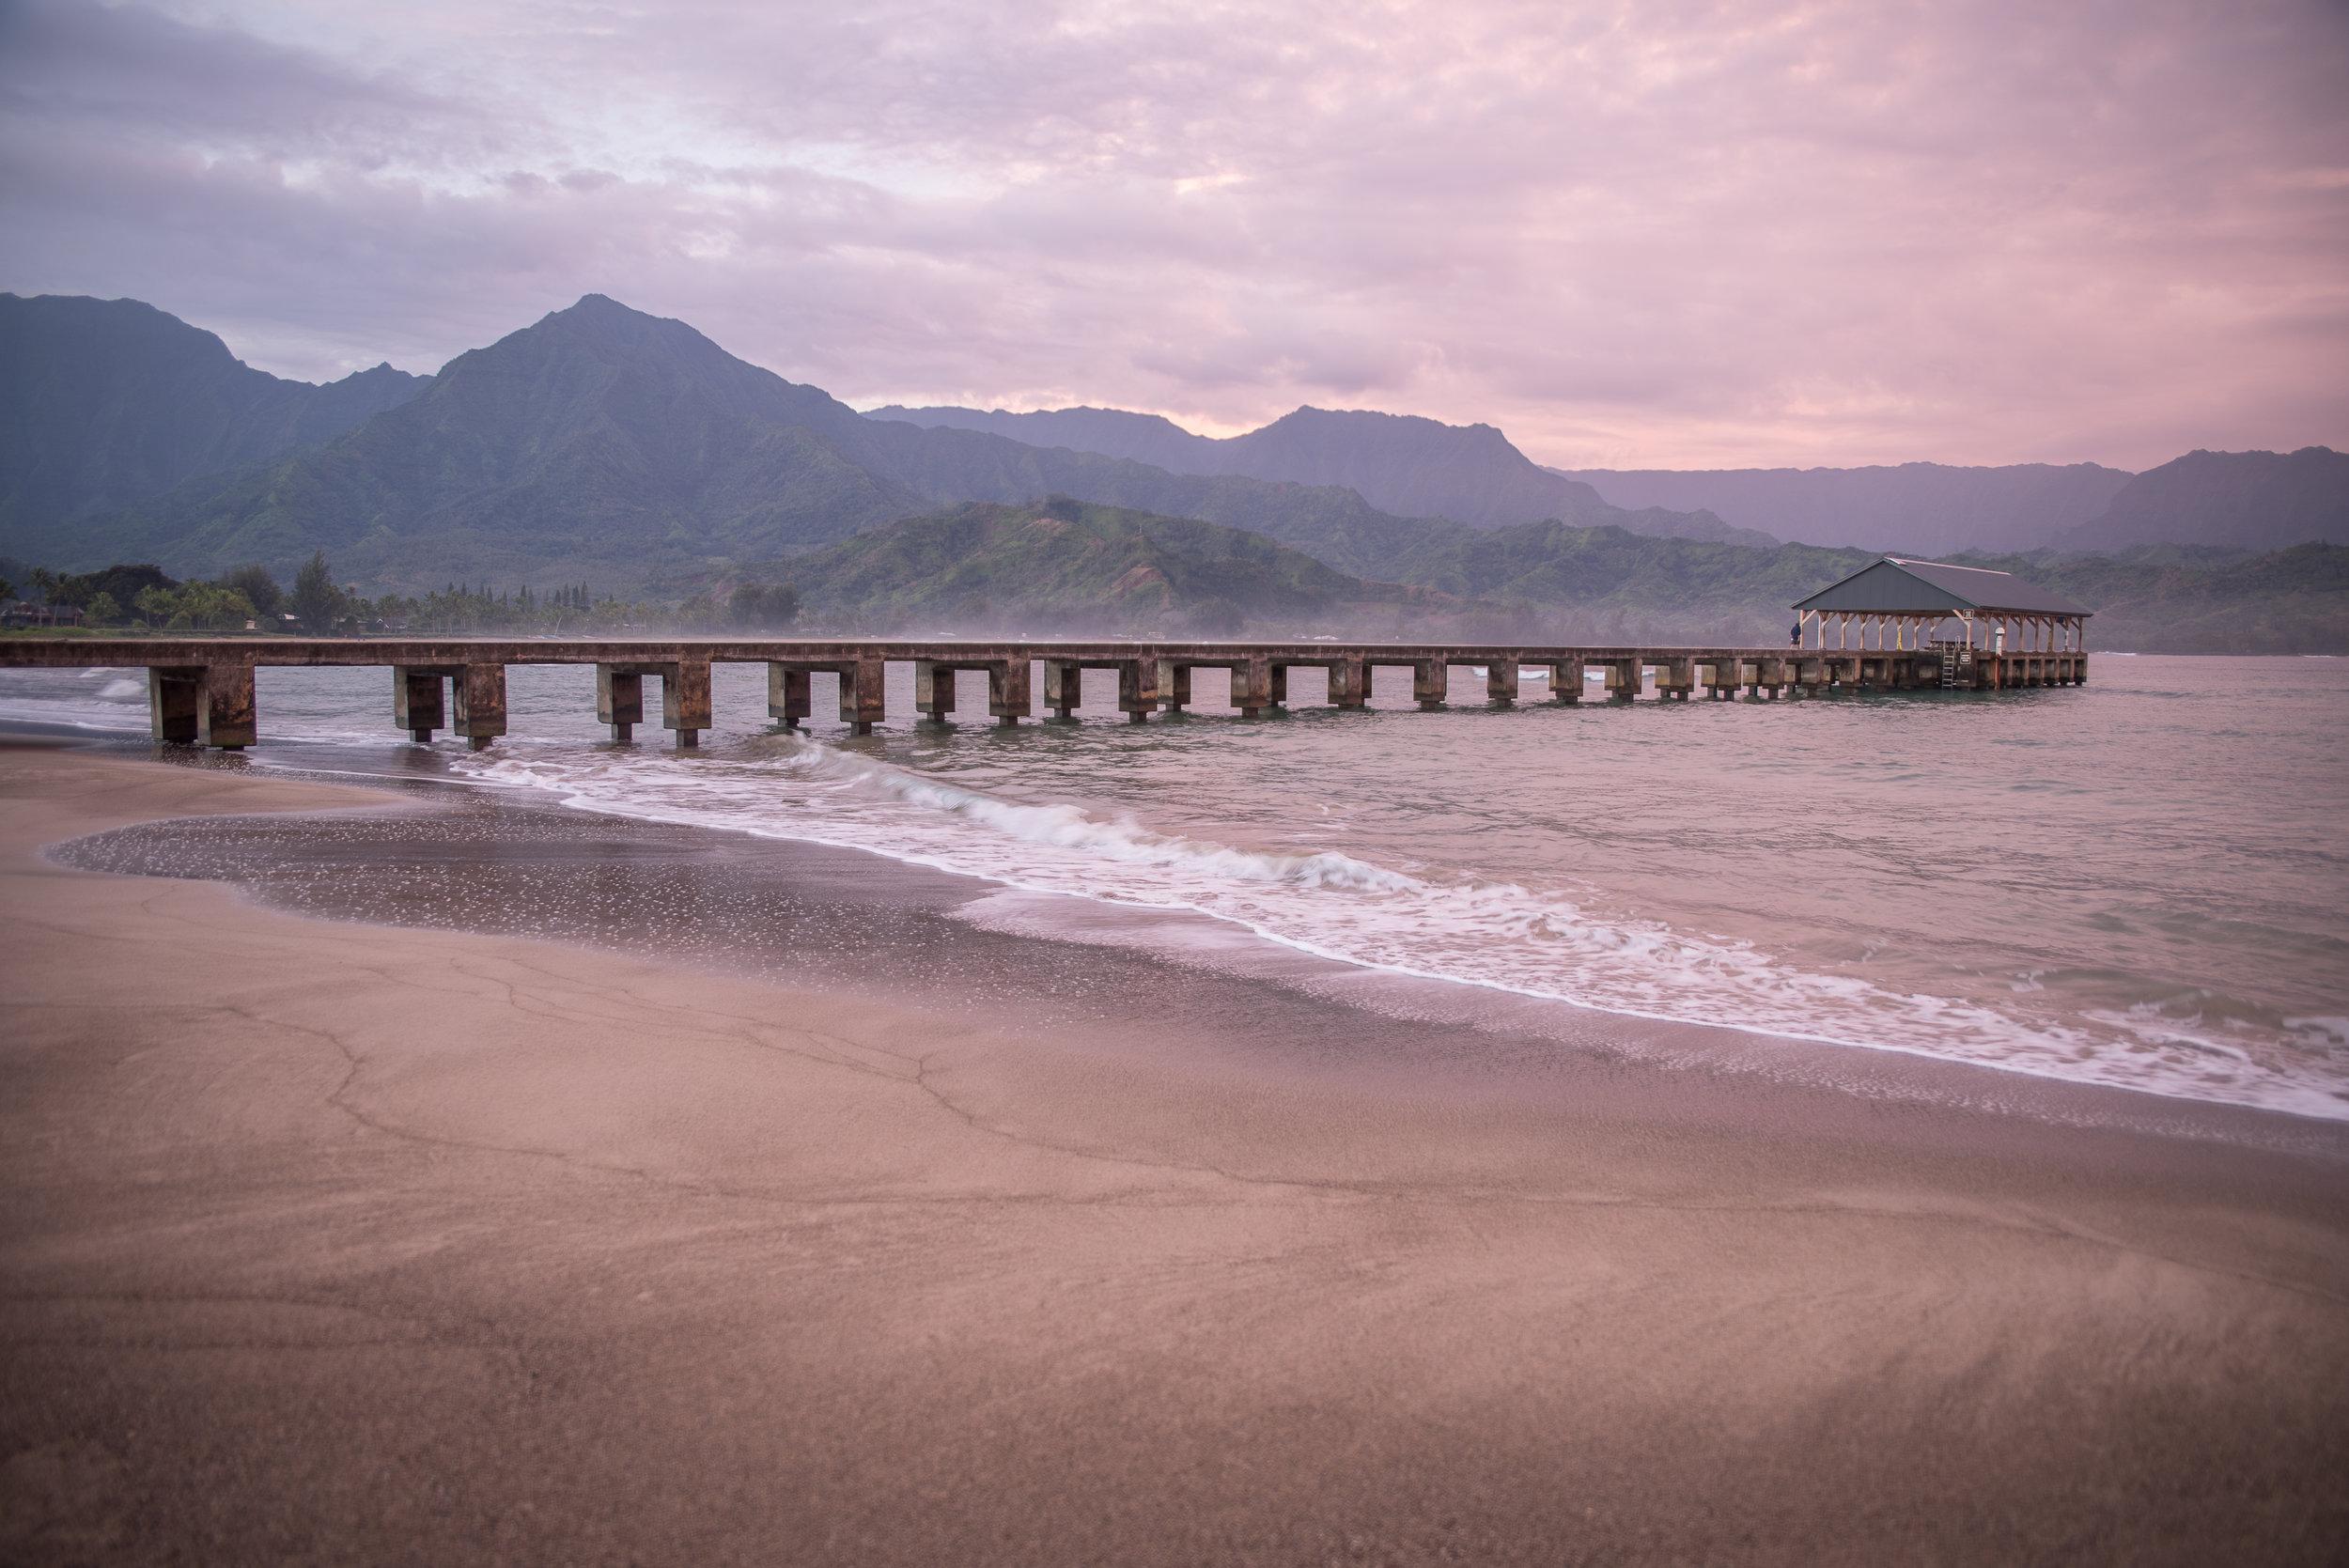 KauaiAdventurePhotographyWorkshop.JPG